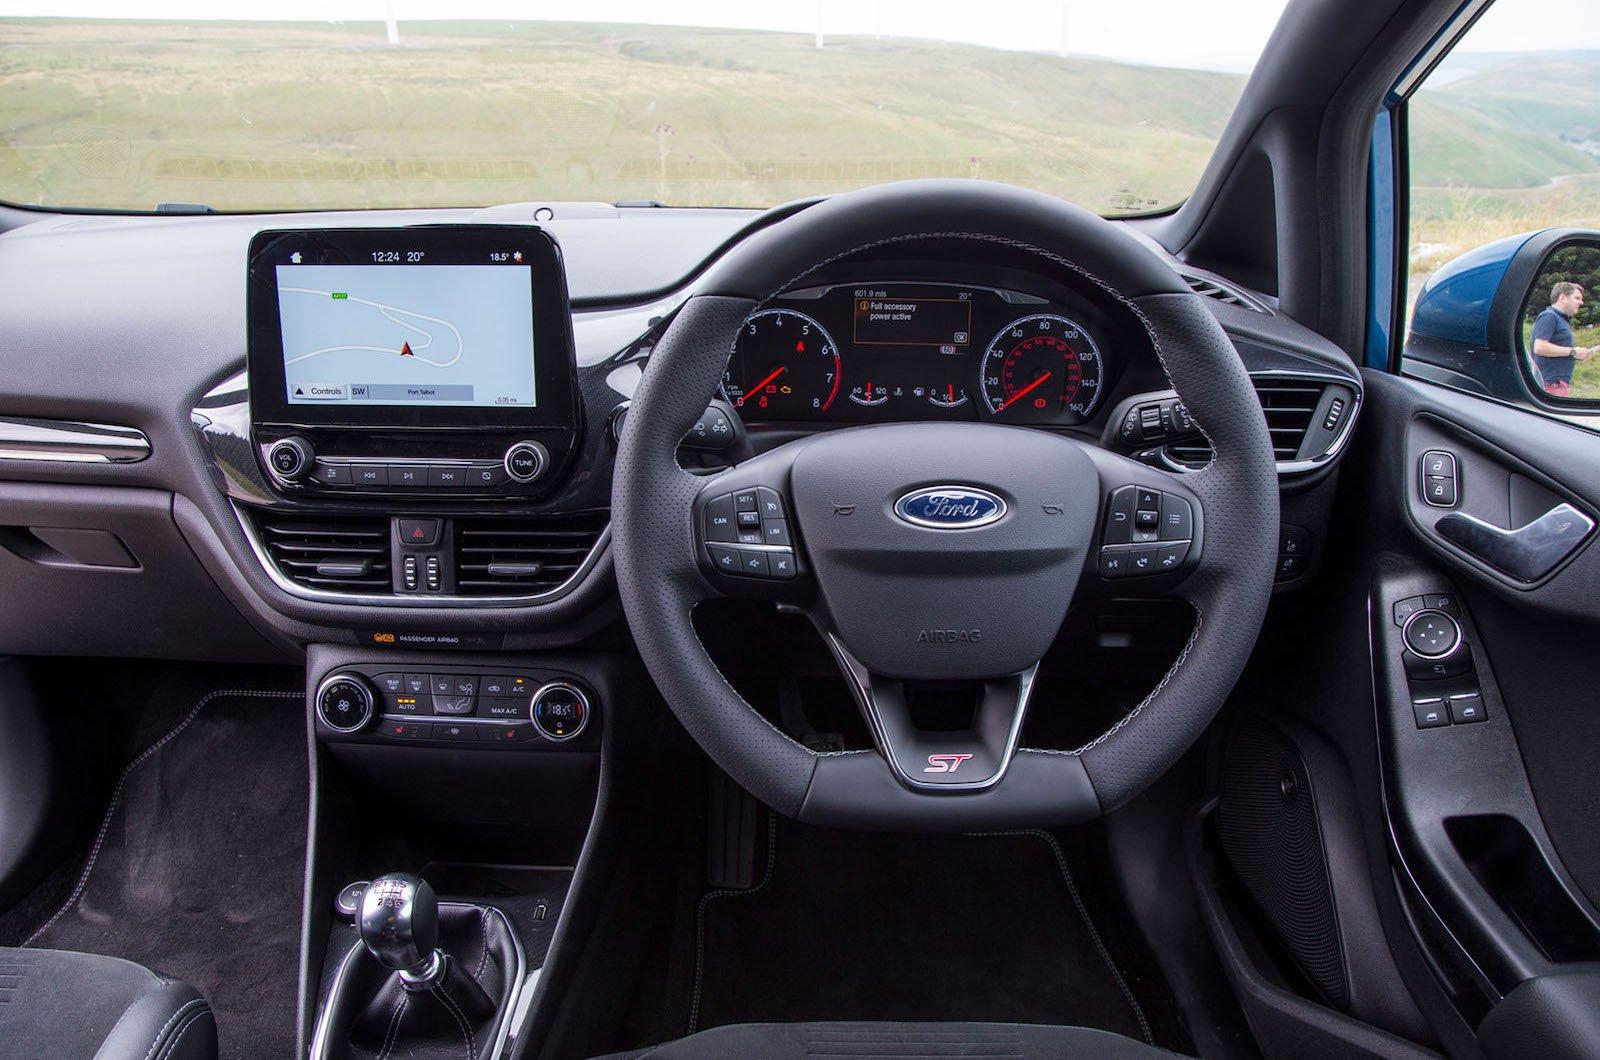 Ford Fiesta ST 2021 dashboard